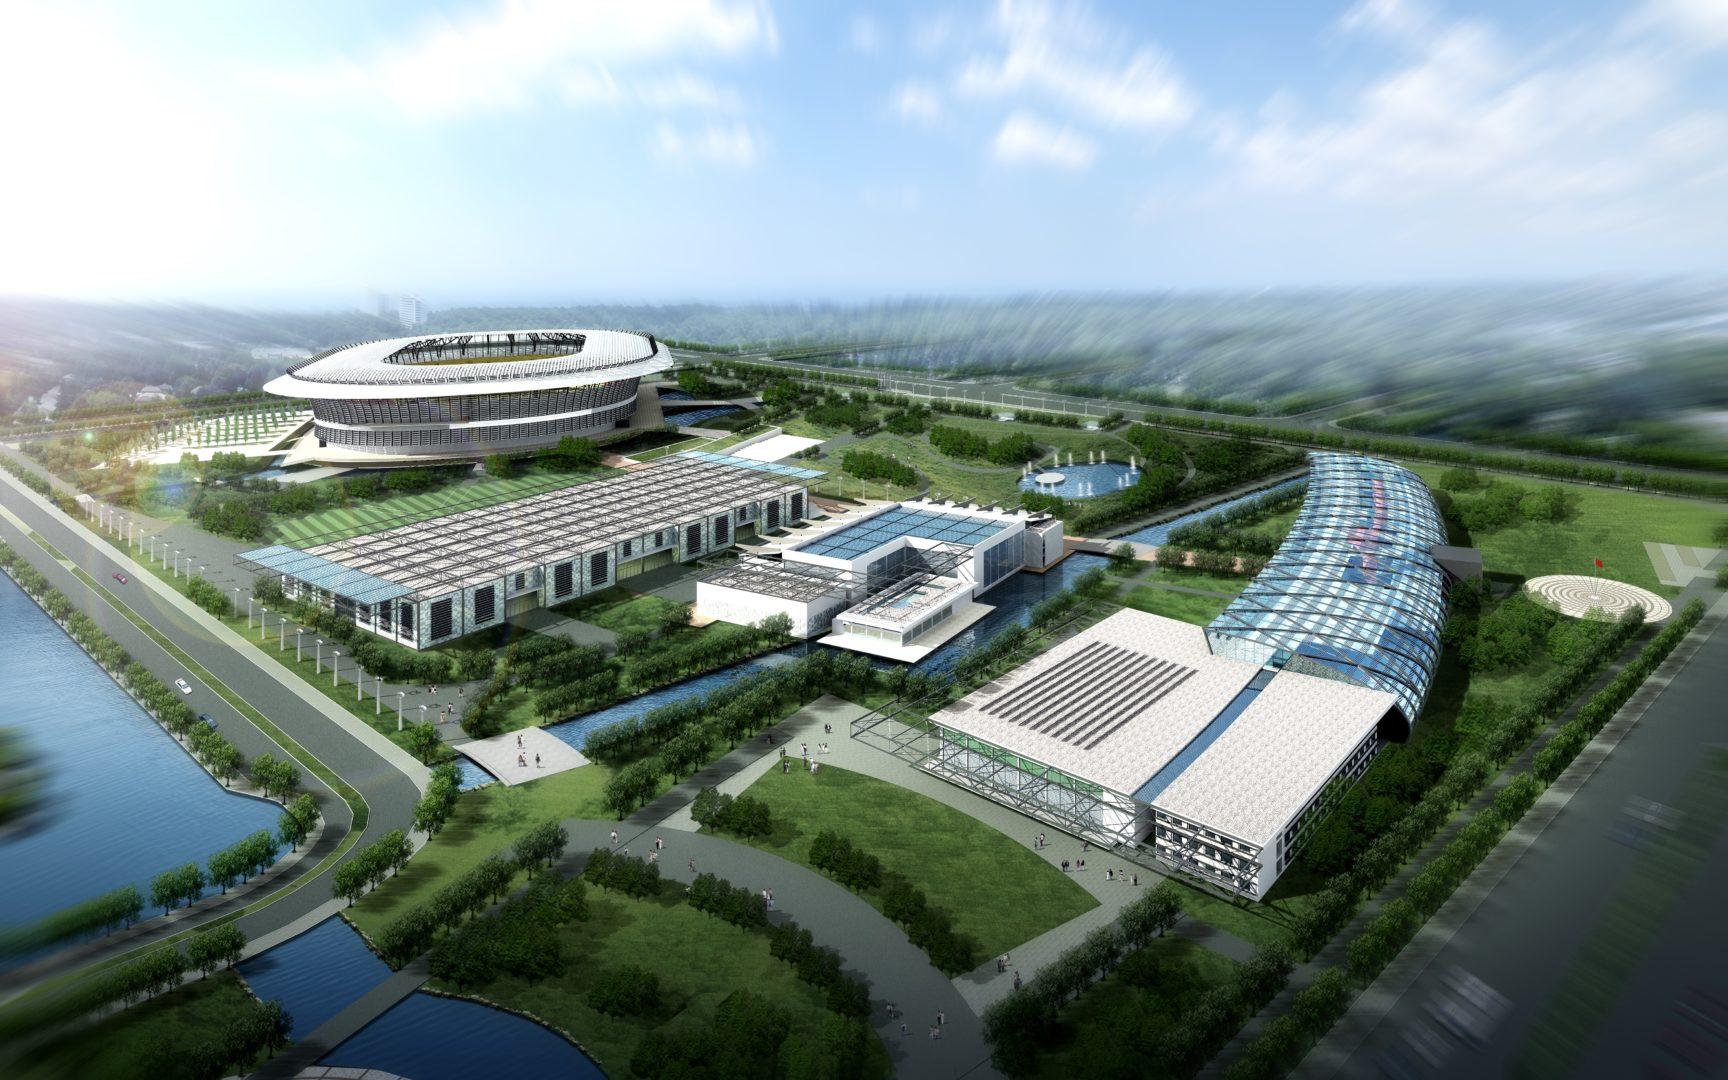 Yancheng Sportspark